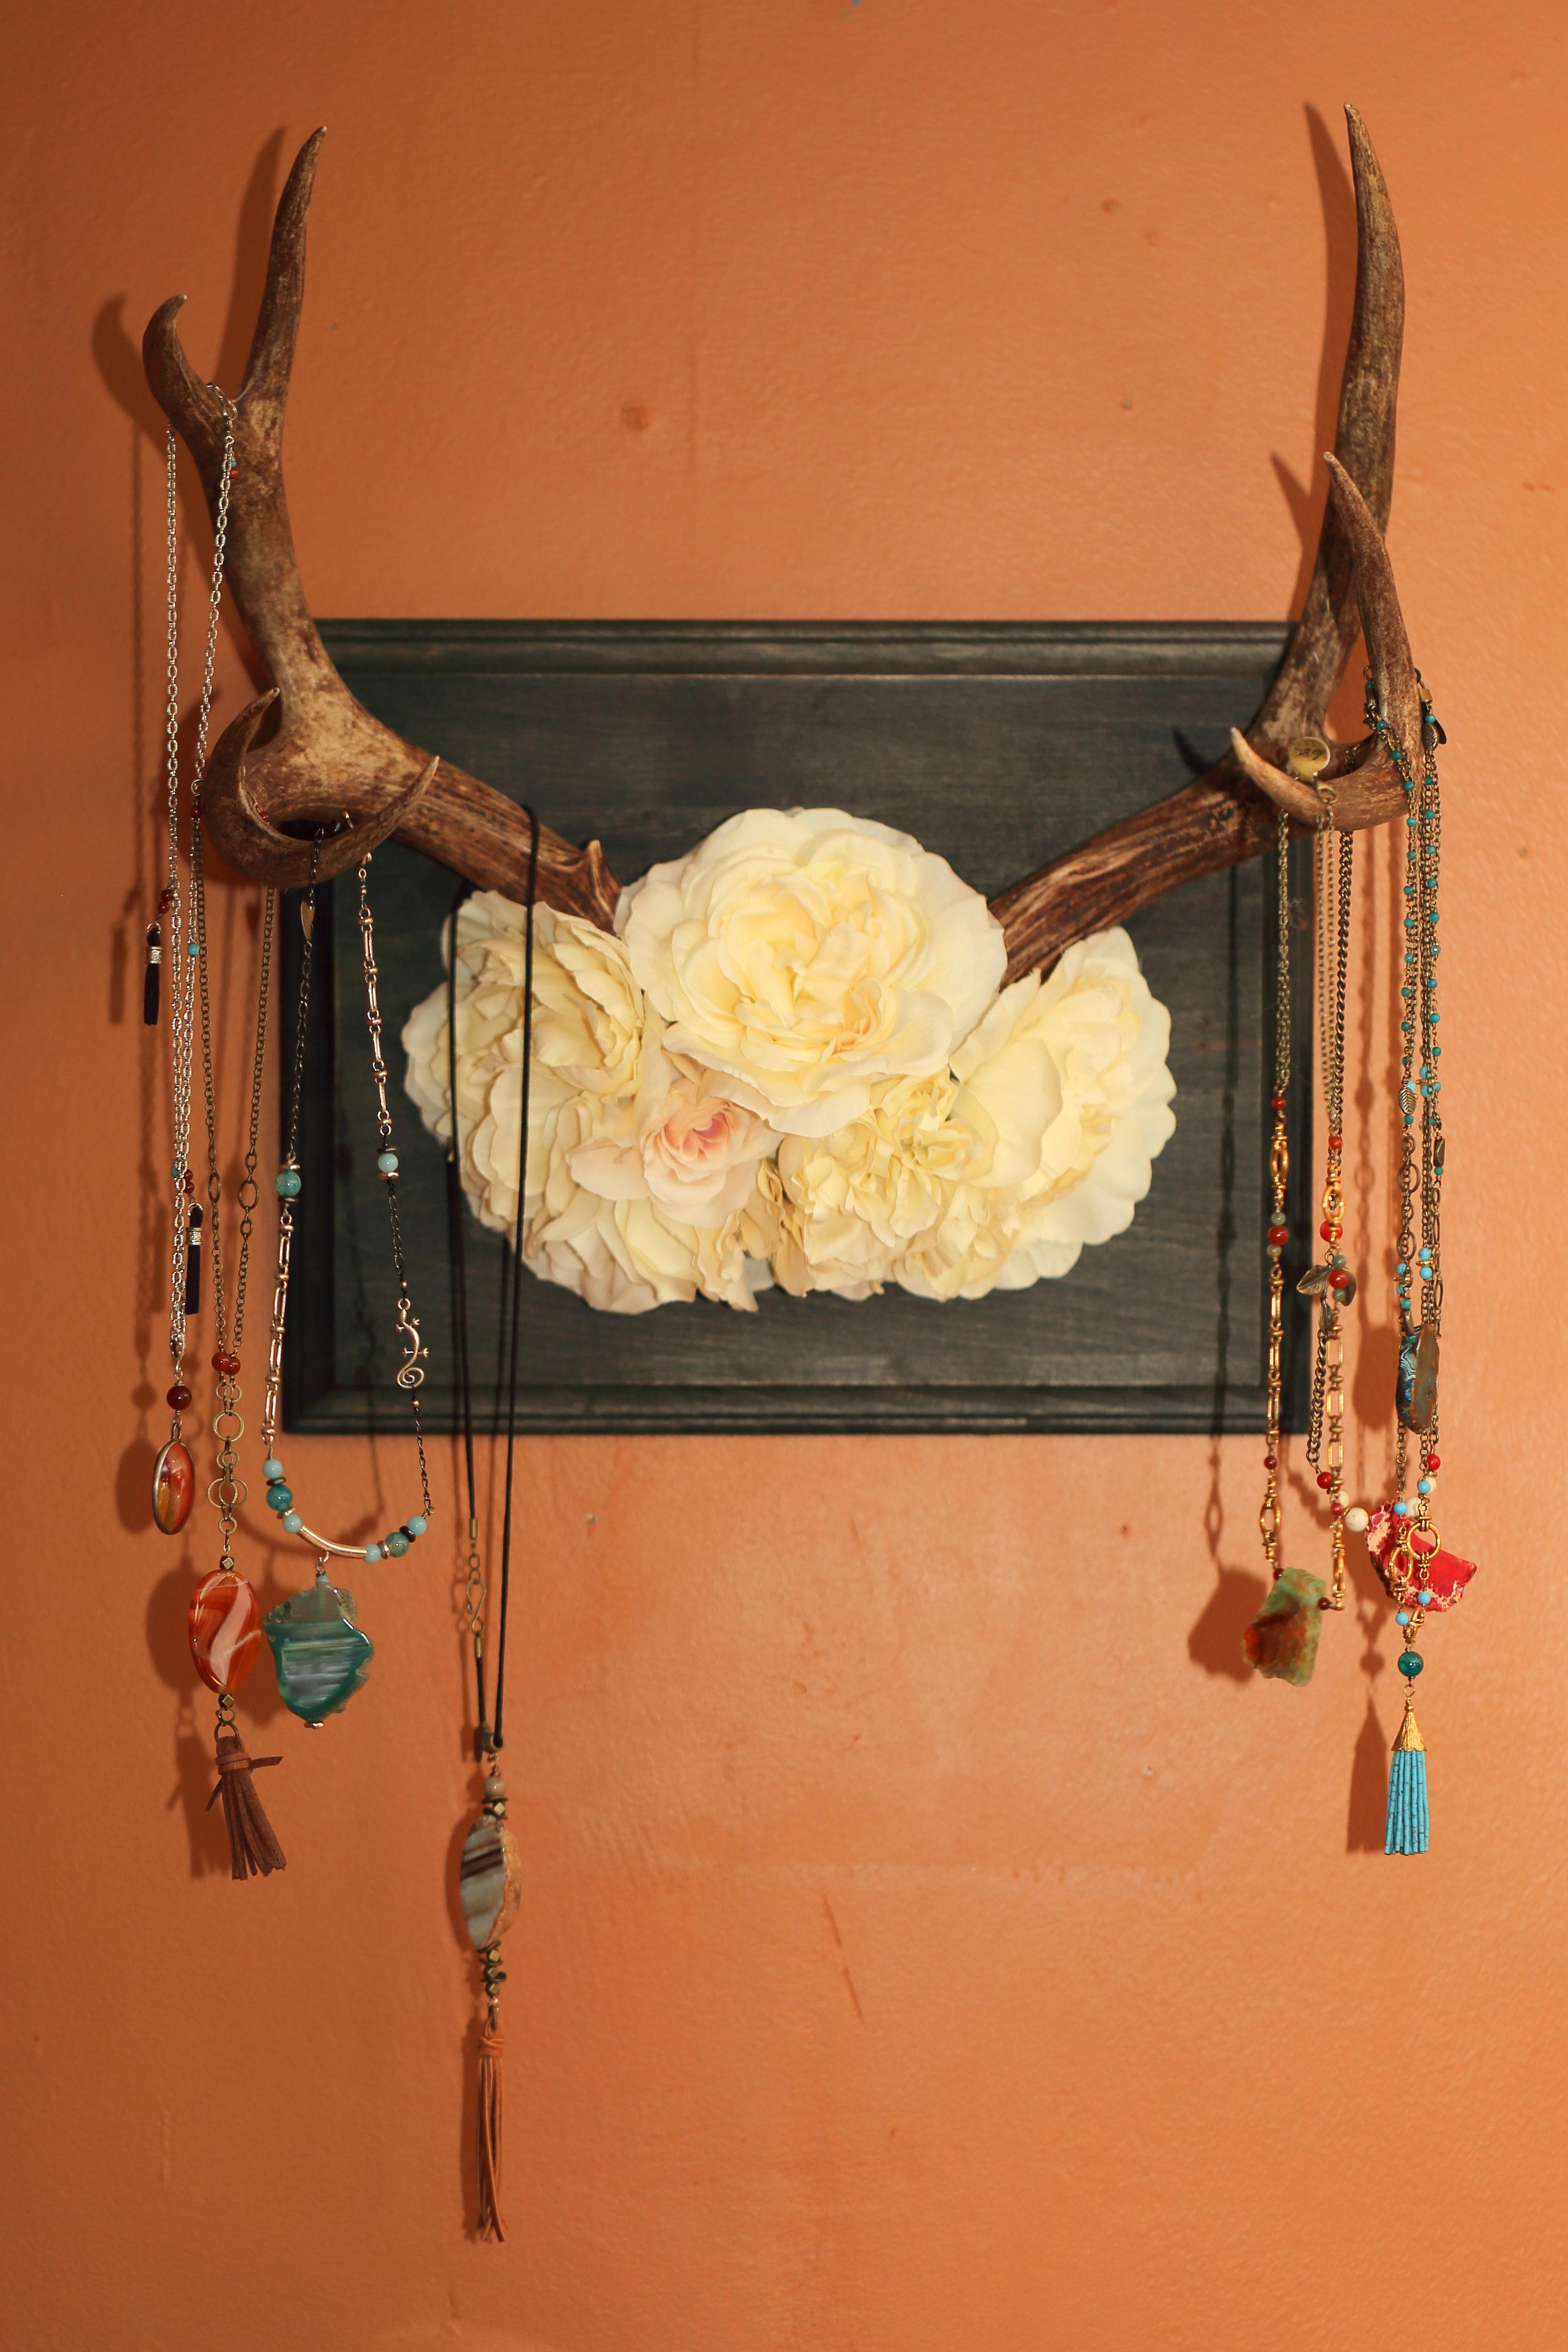 Artfully displayed jewelry